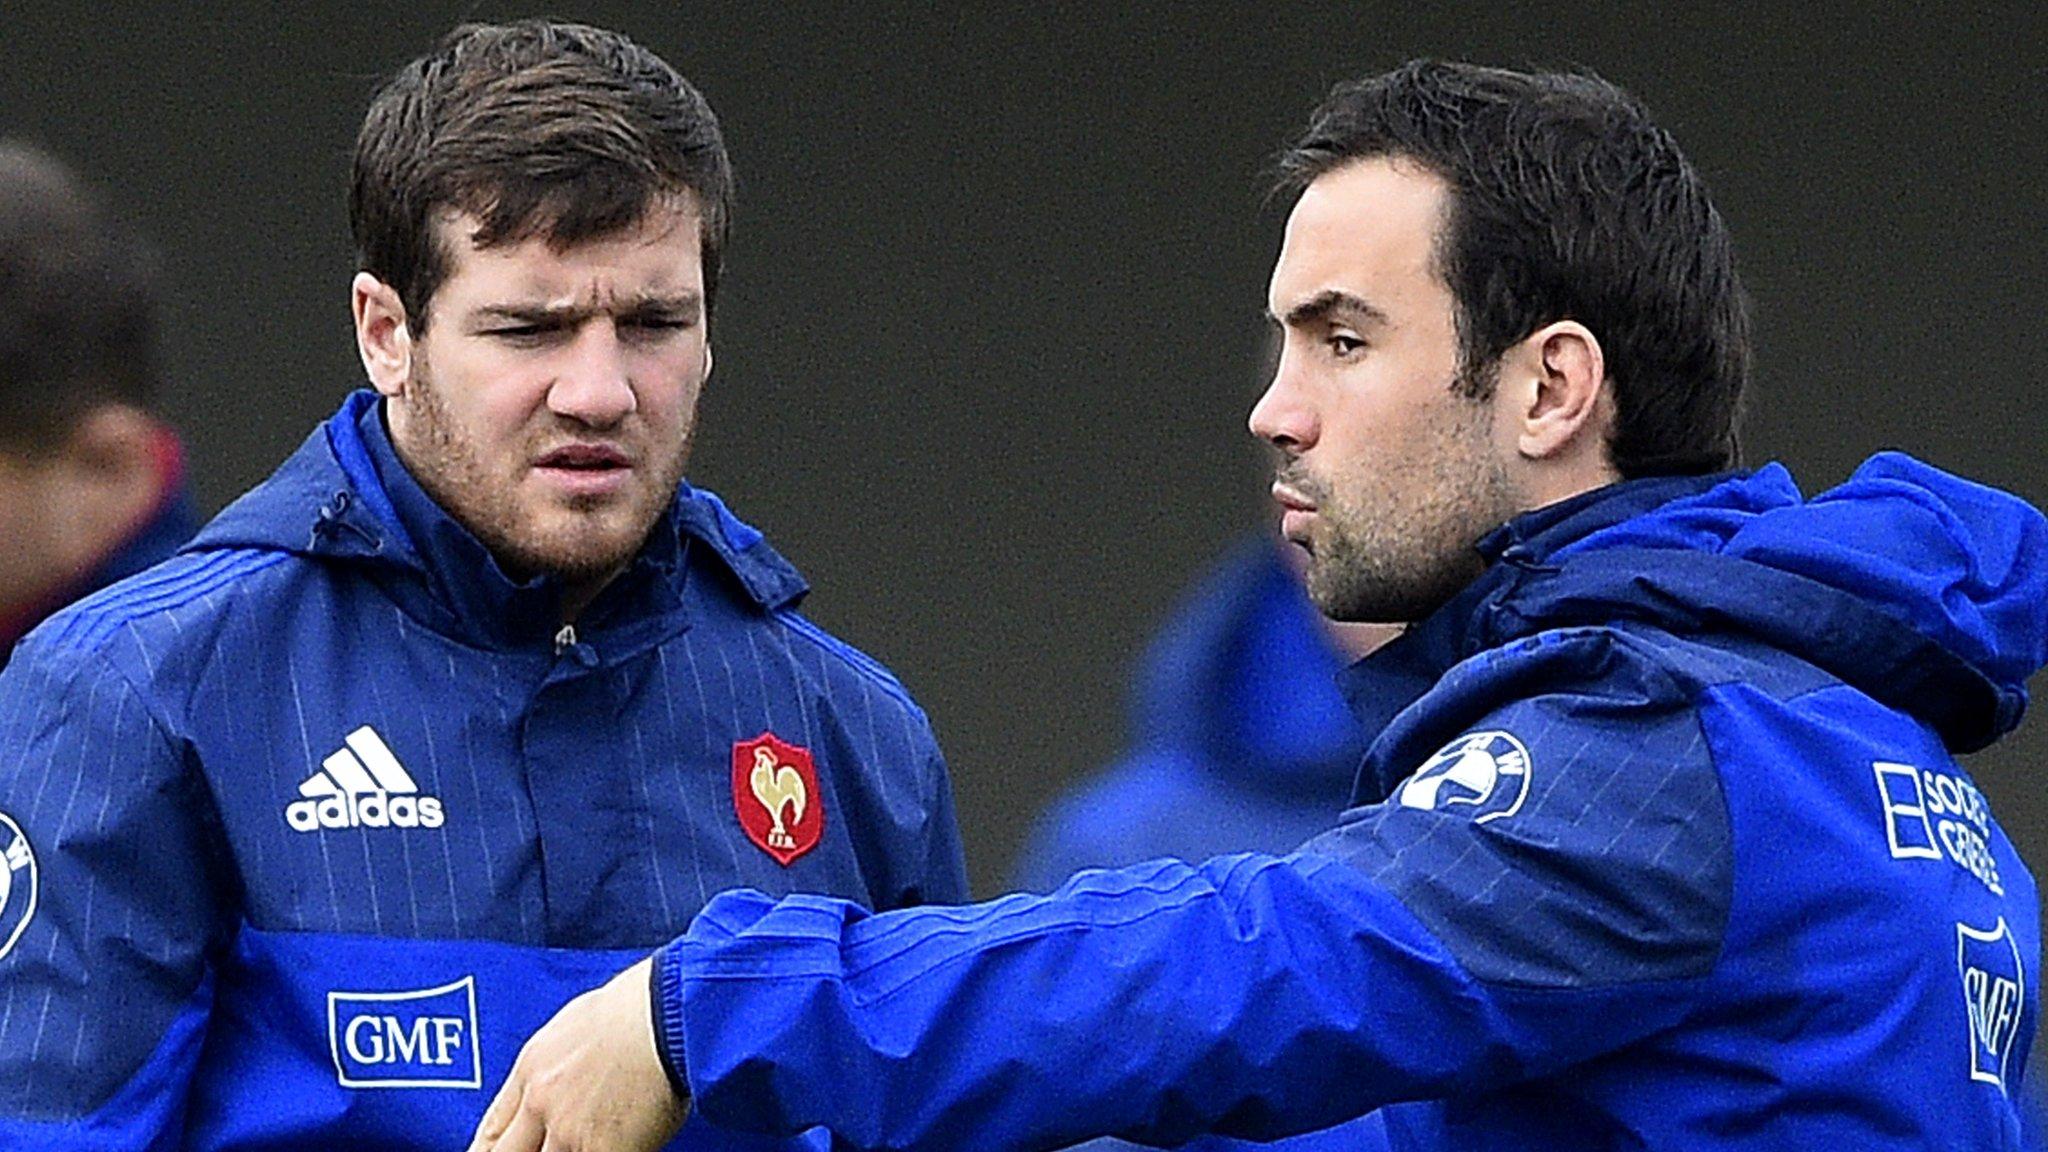 Teenager Ntamack to make first start at fly-half for France against Scotland